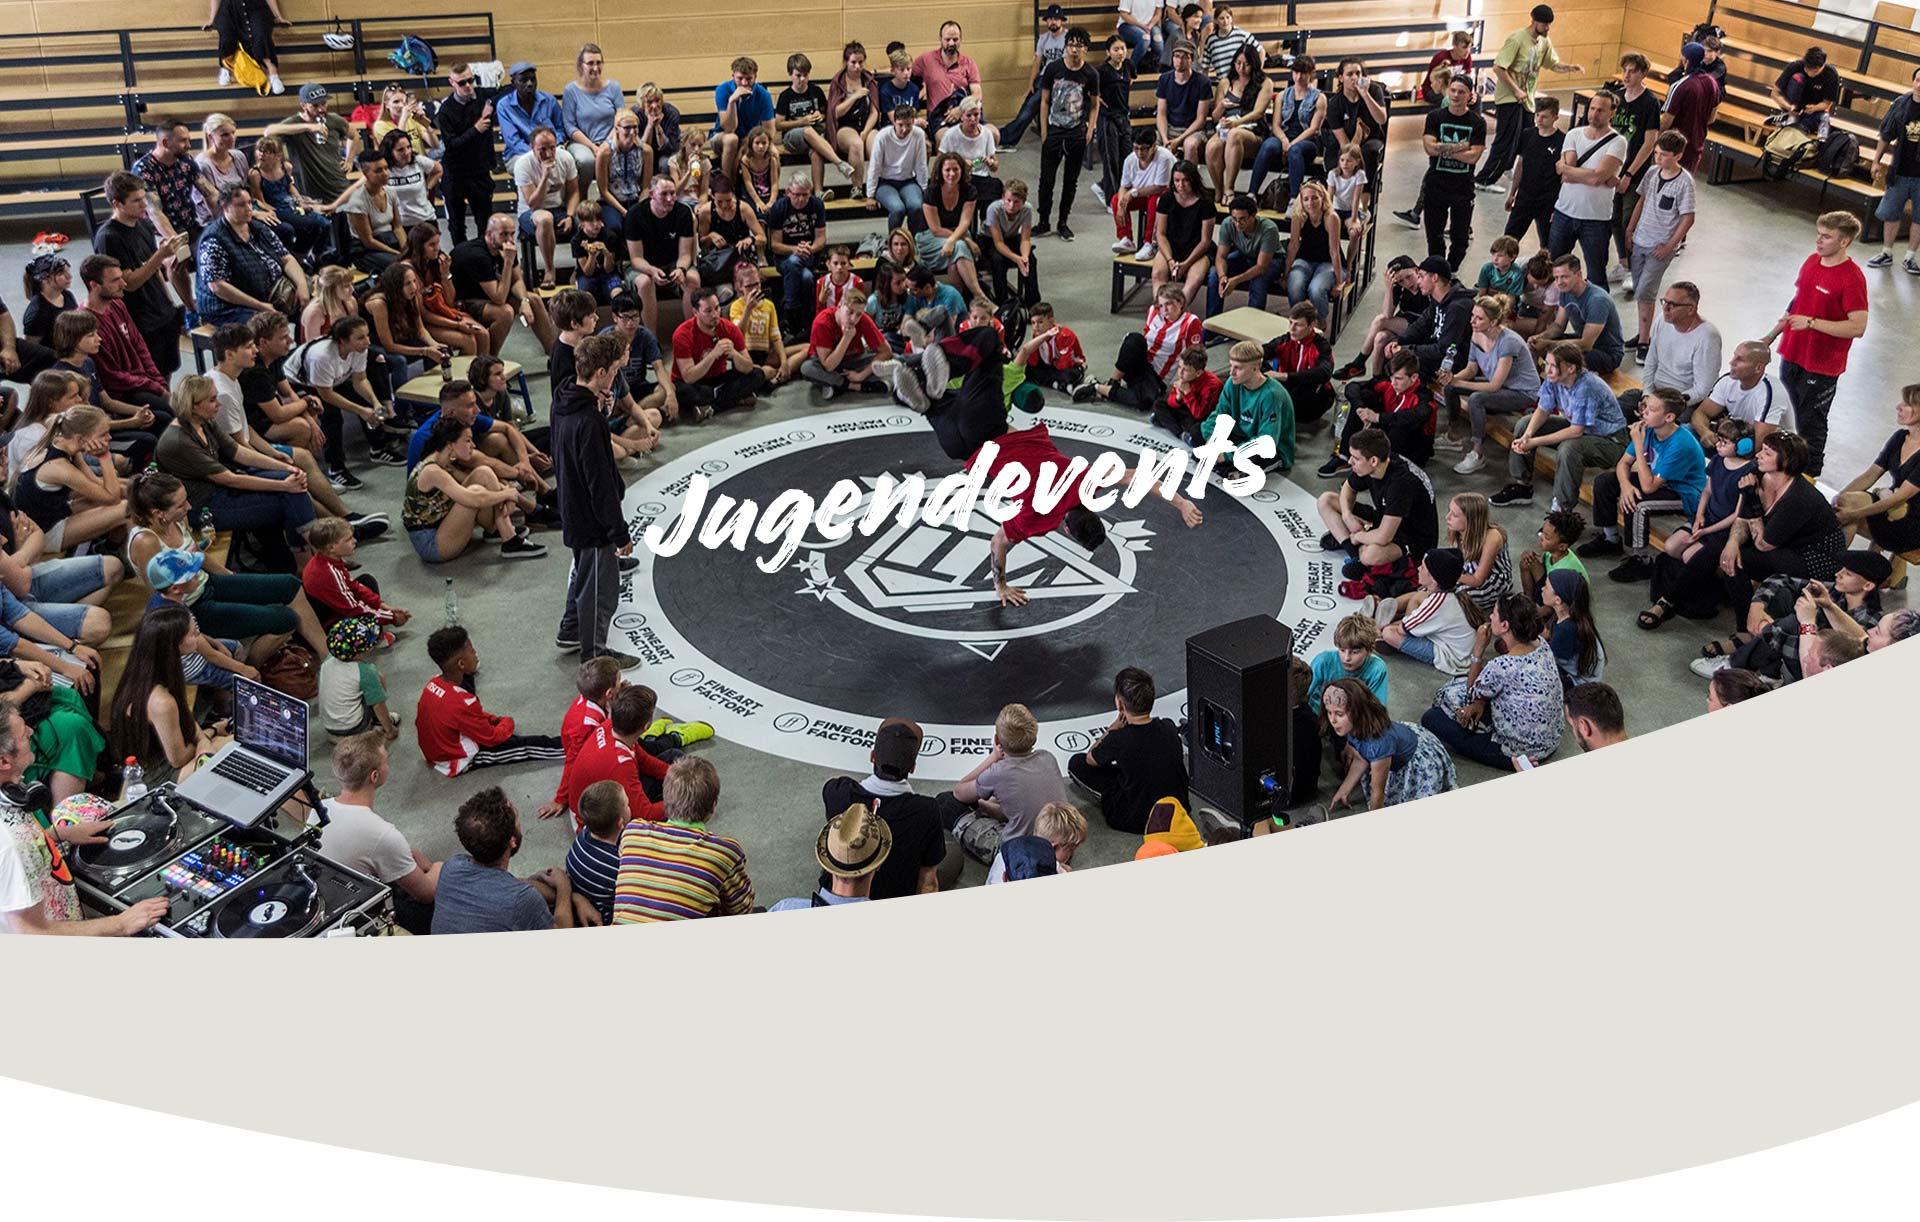 HERO_SOCIETY-Header_Jugendevents